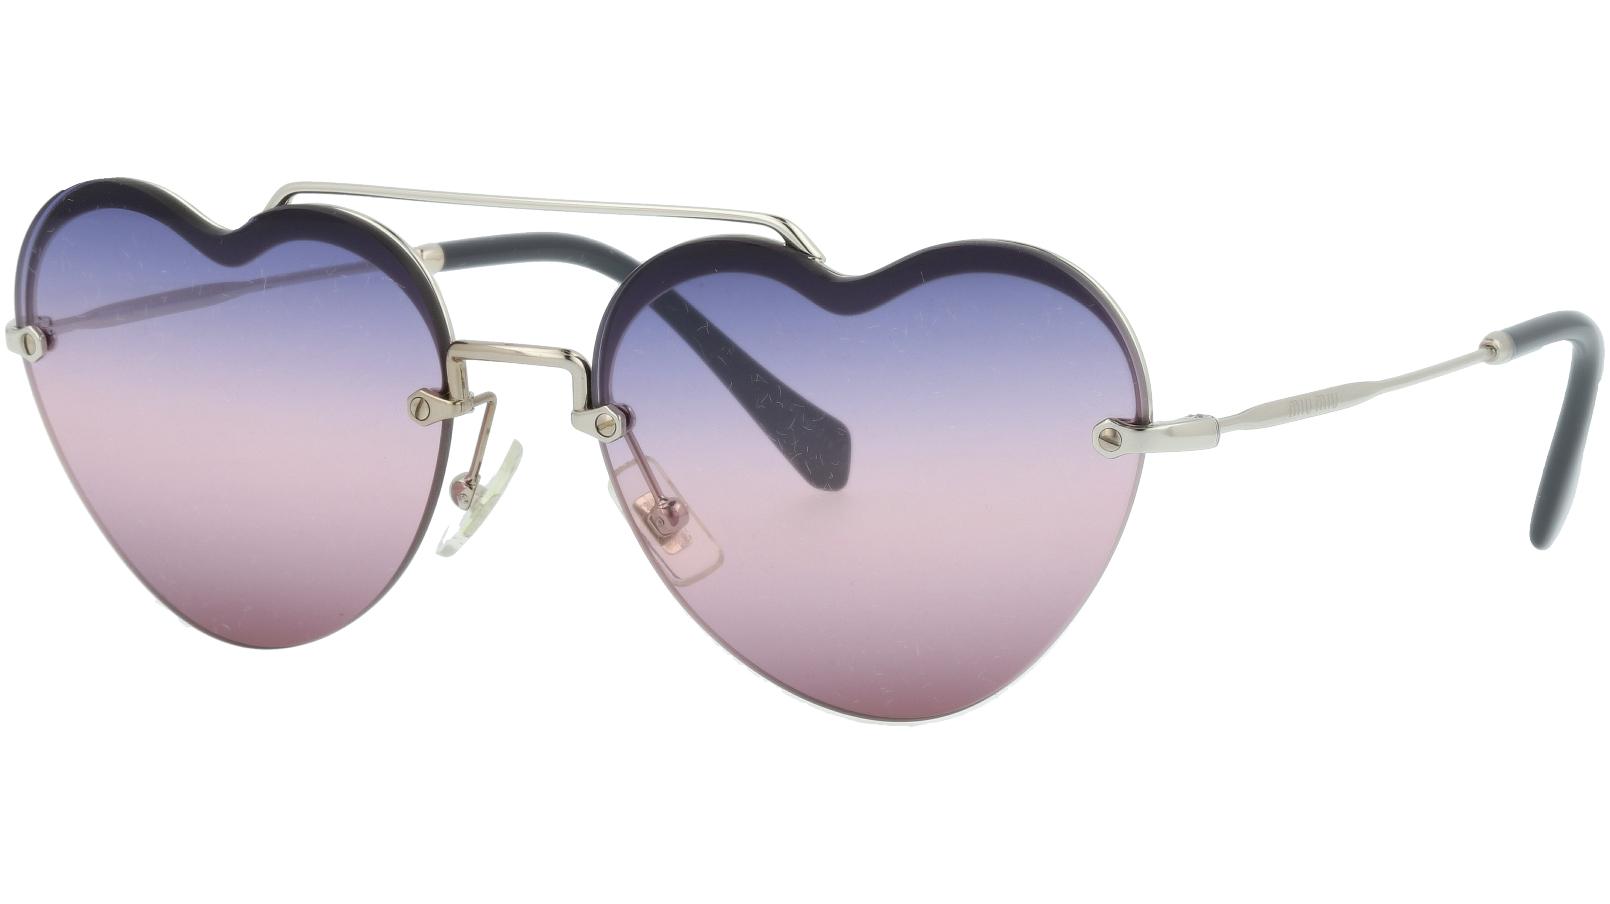 Miu Miu MU62US 1BC157 58 Violet Sunglasses